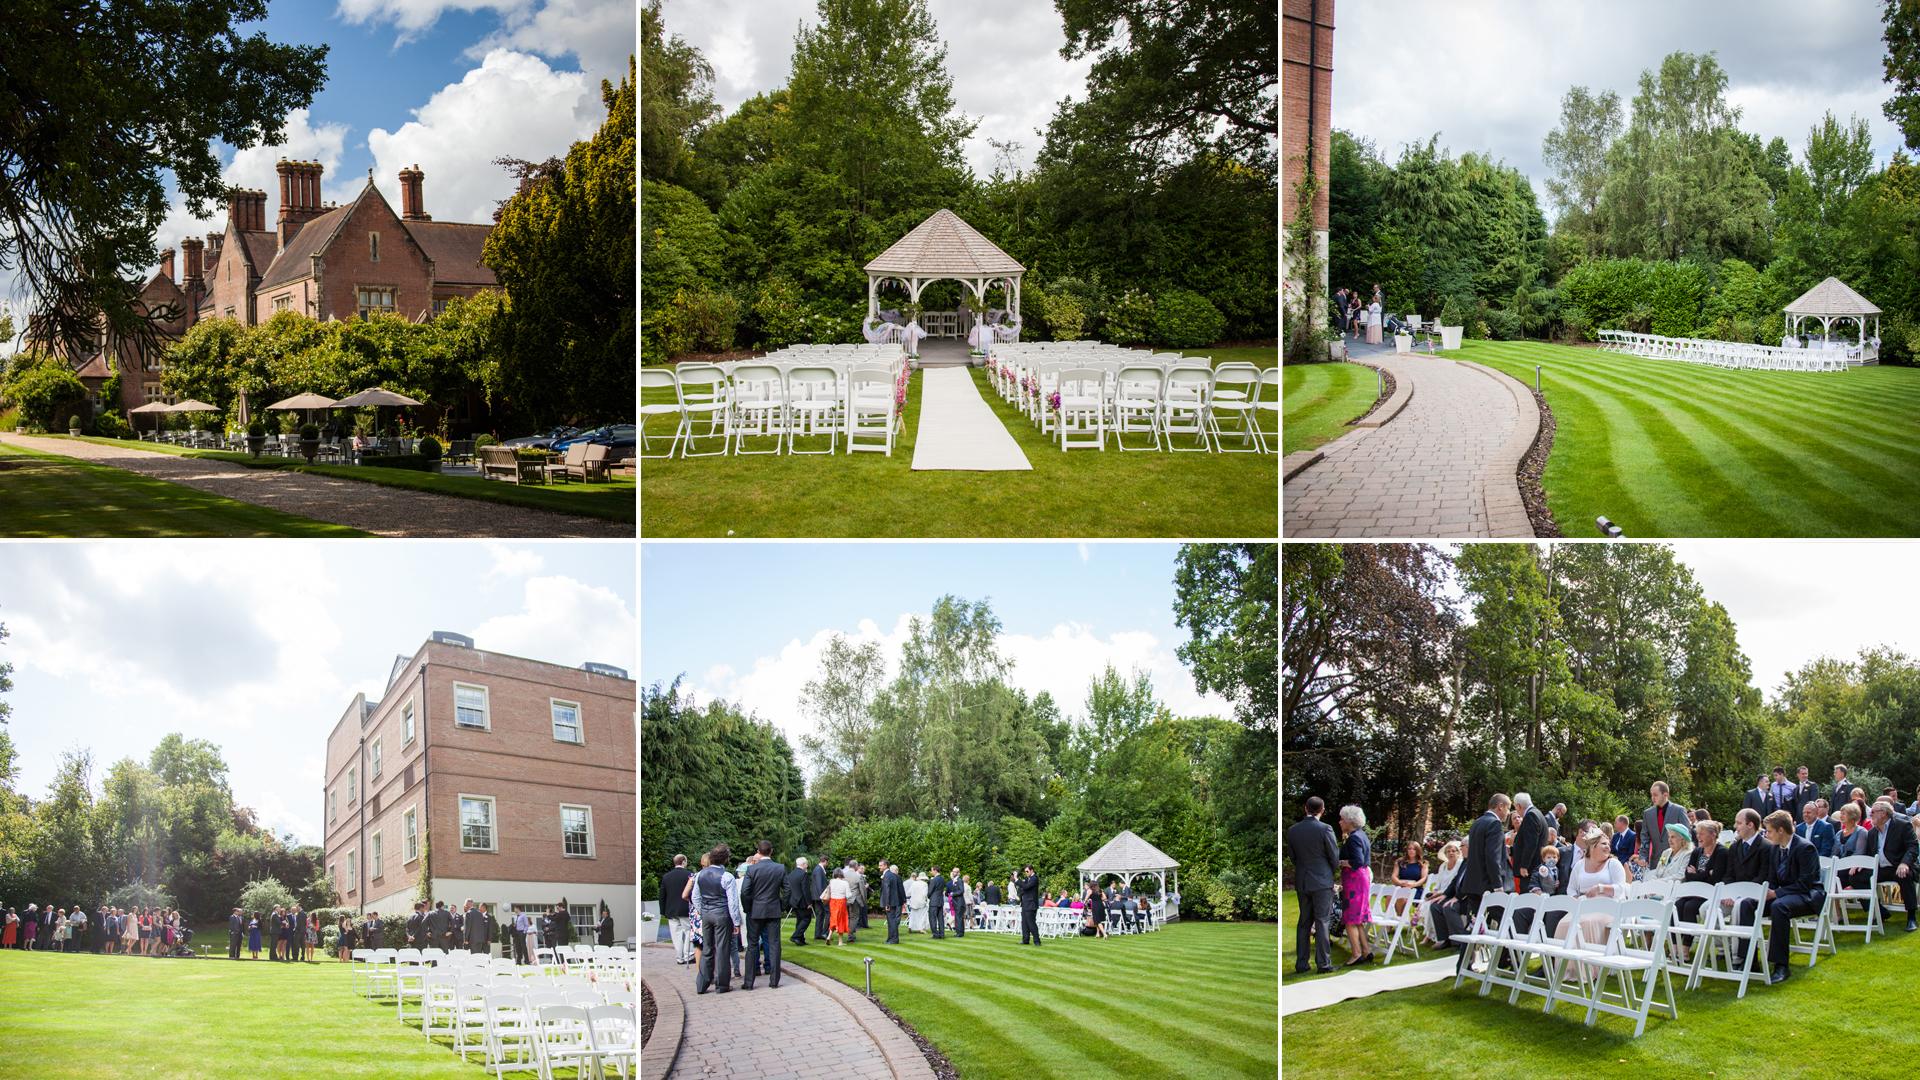 alexander house wedding photography,  sussex wedding photographer, outdoor ceremony